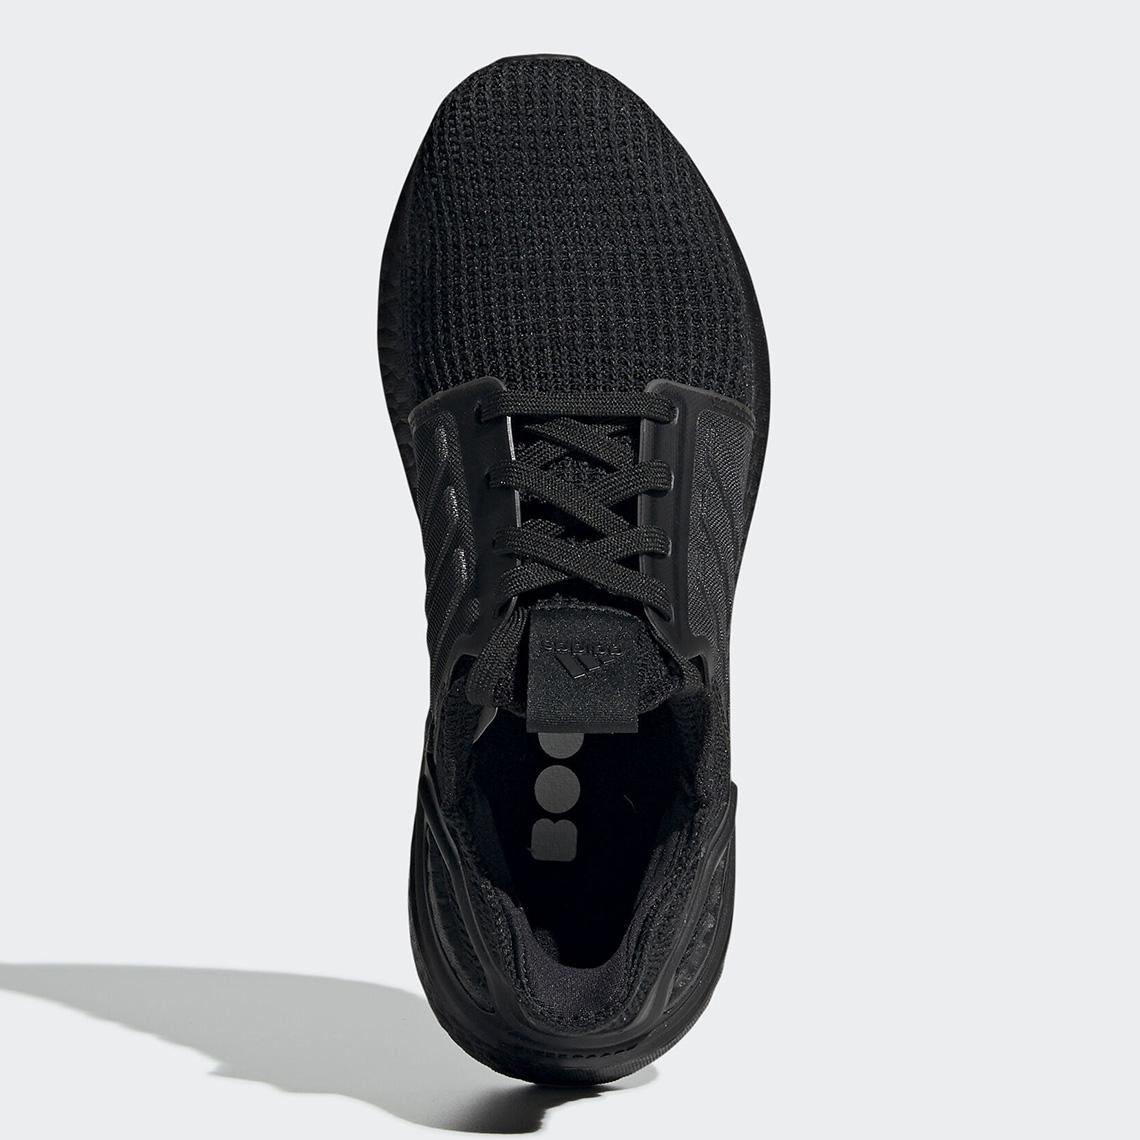 eff45401 adidas Ultra Boost 19 Triple Black EF1345 Release Date | SneakerNews.com